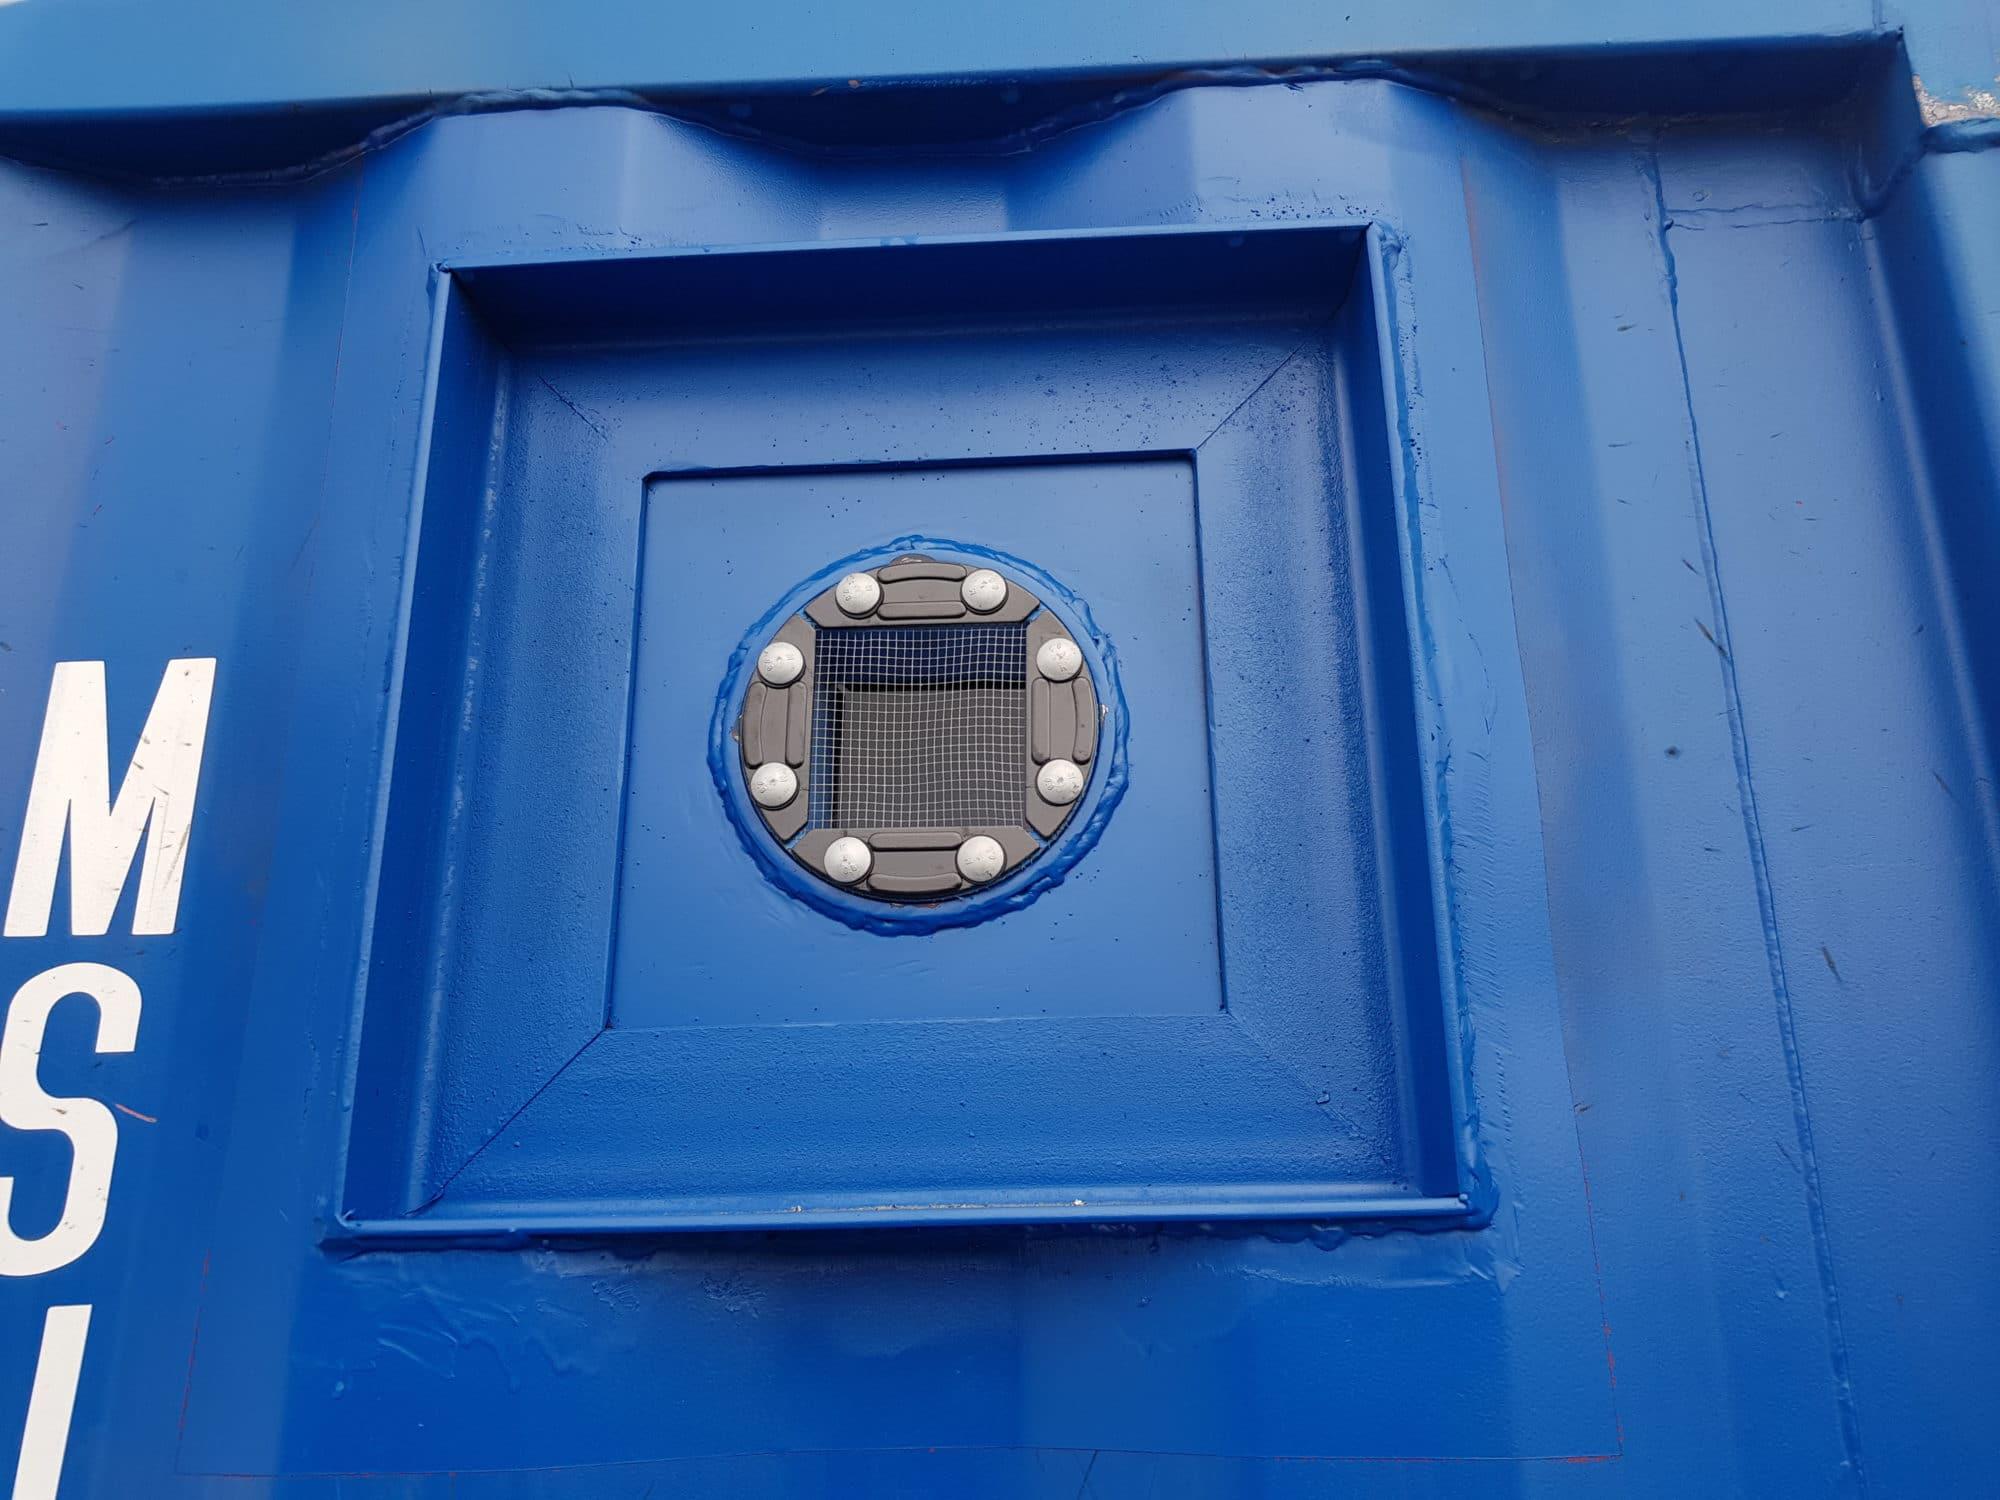 ROV-containere til bruk Offshore